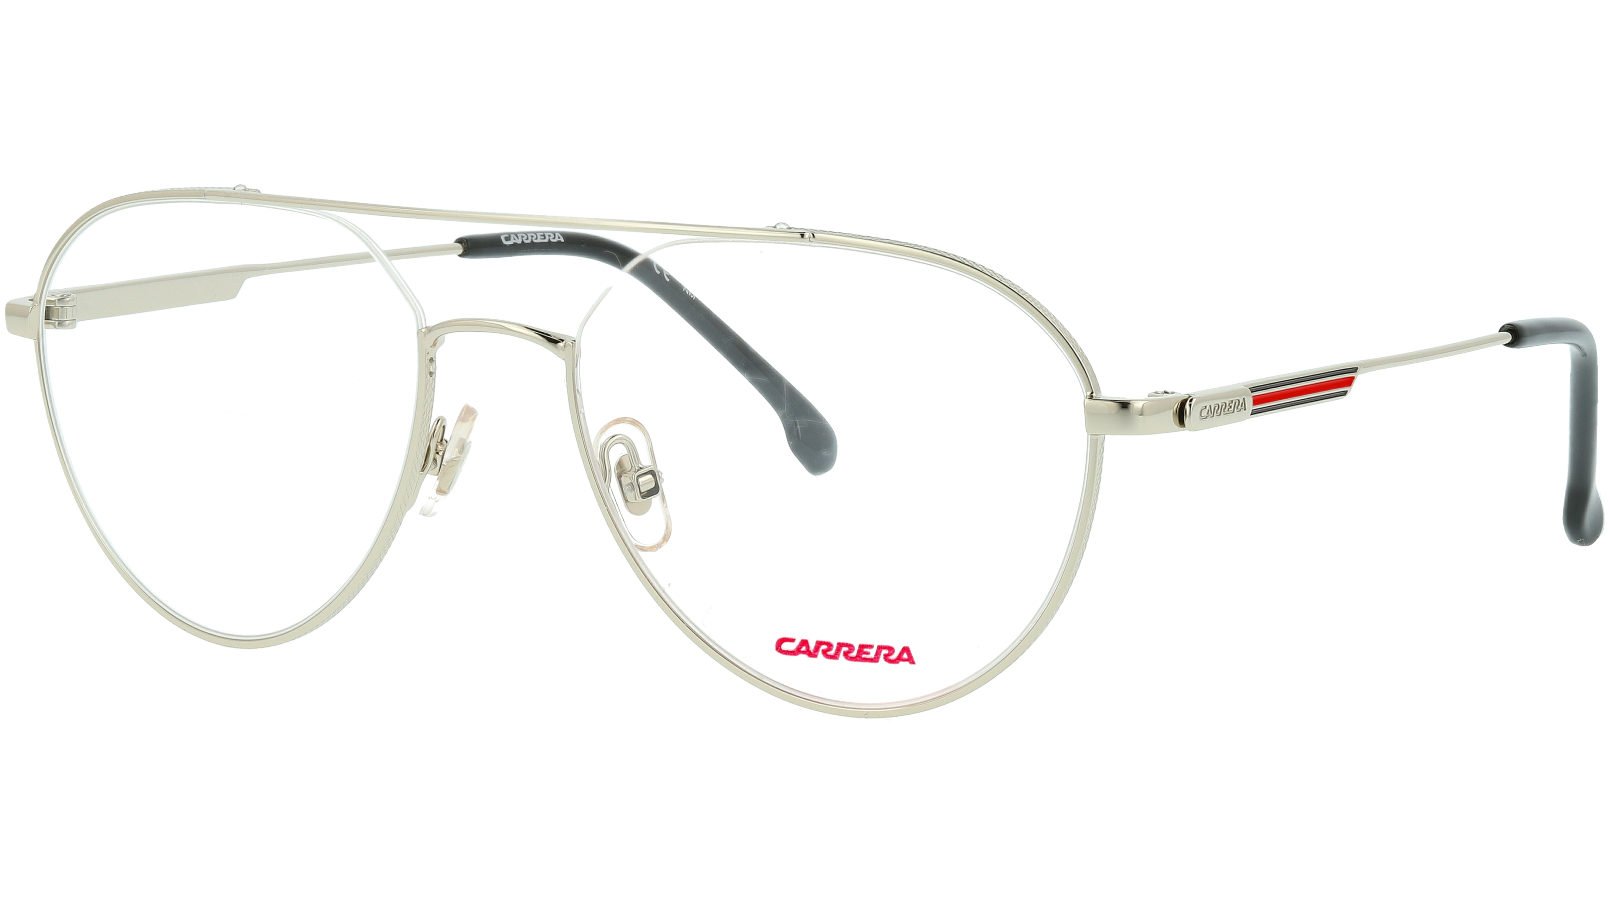 CARRERA CARRERA 1110 010 55 PALLADIUM Glasses